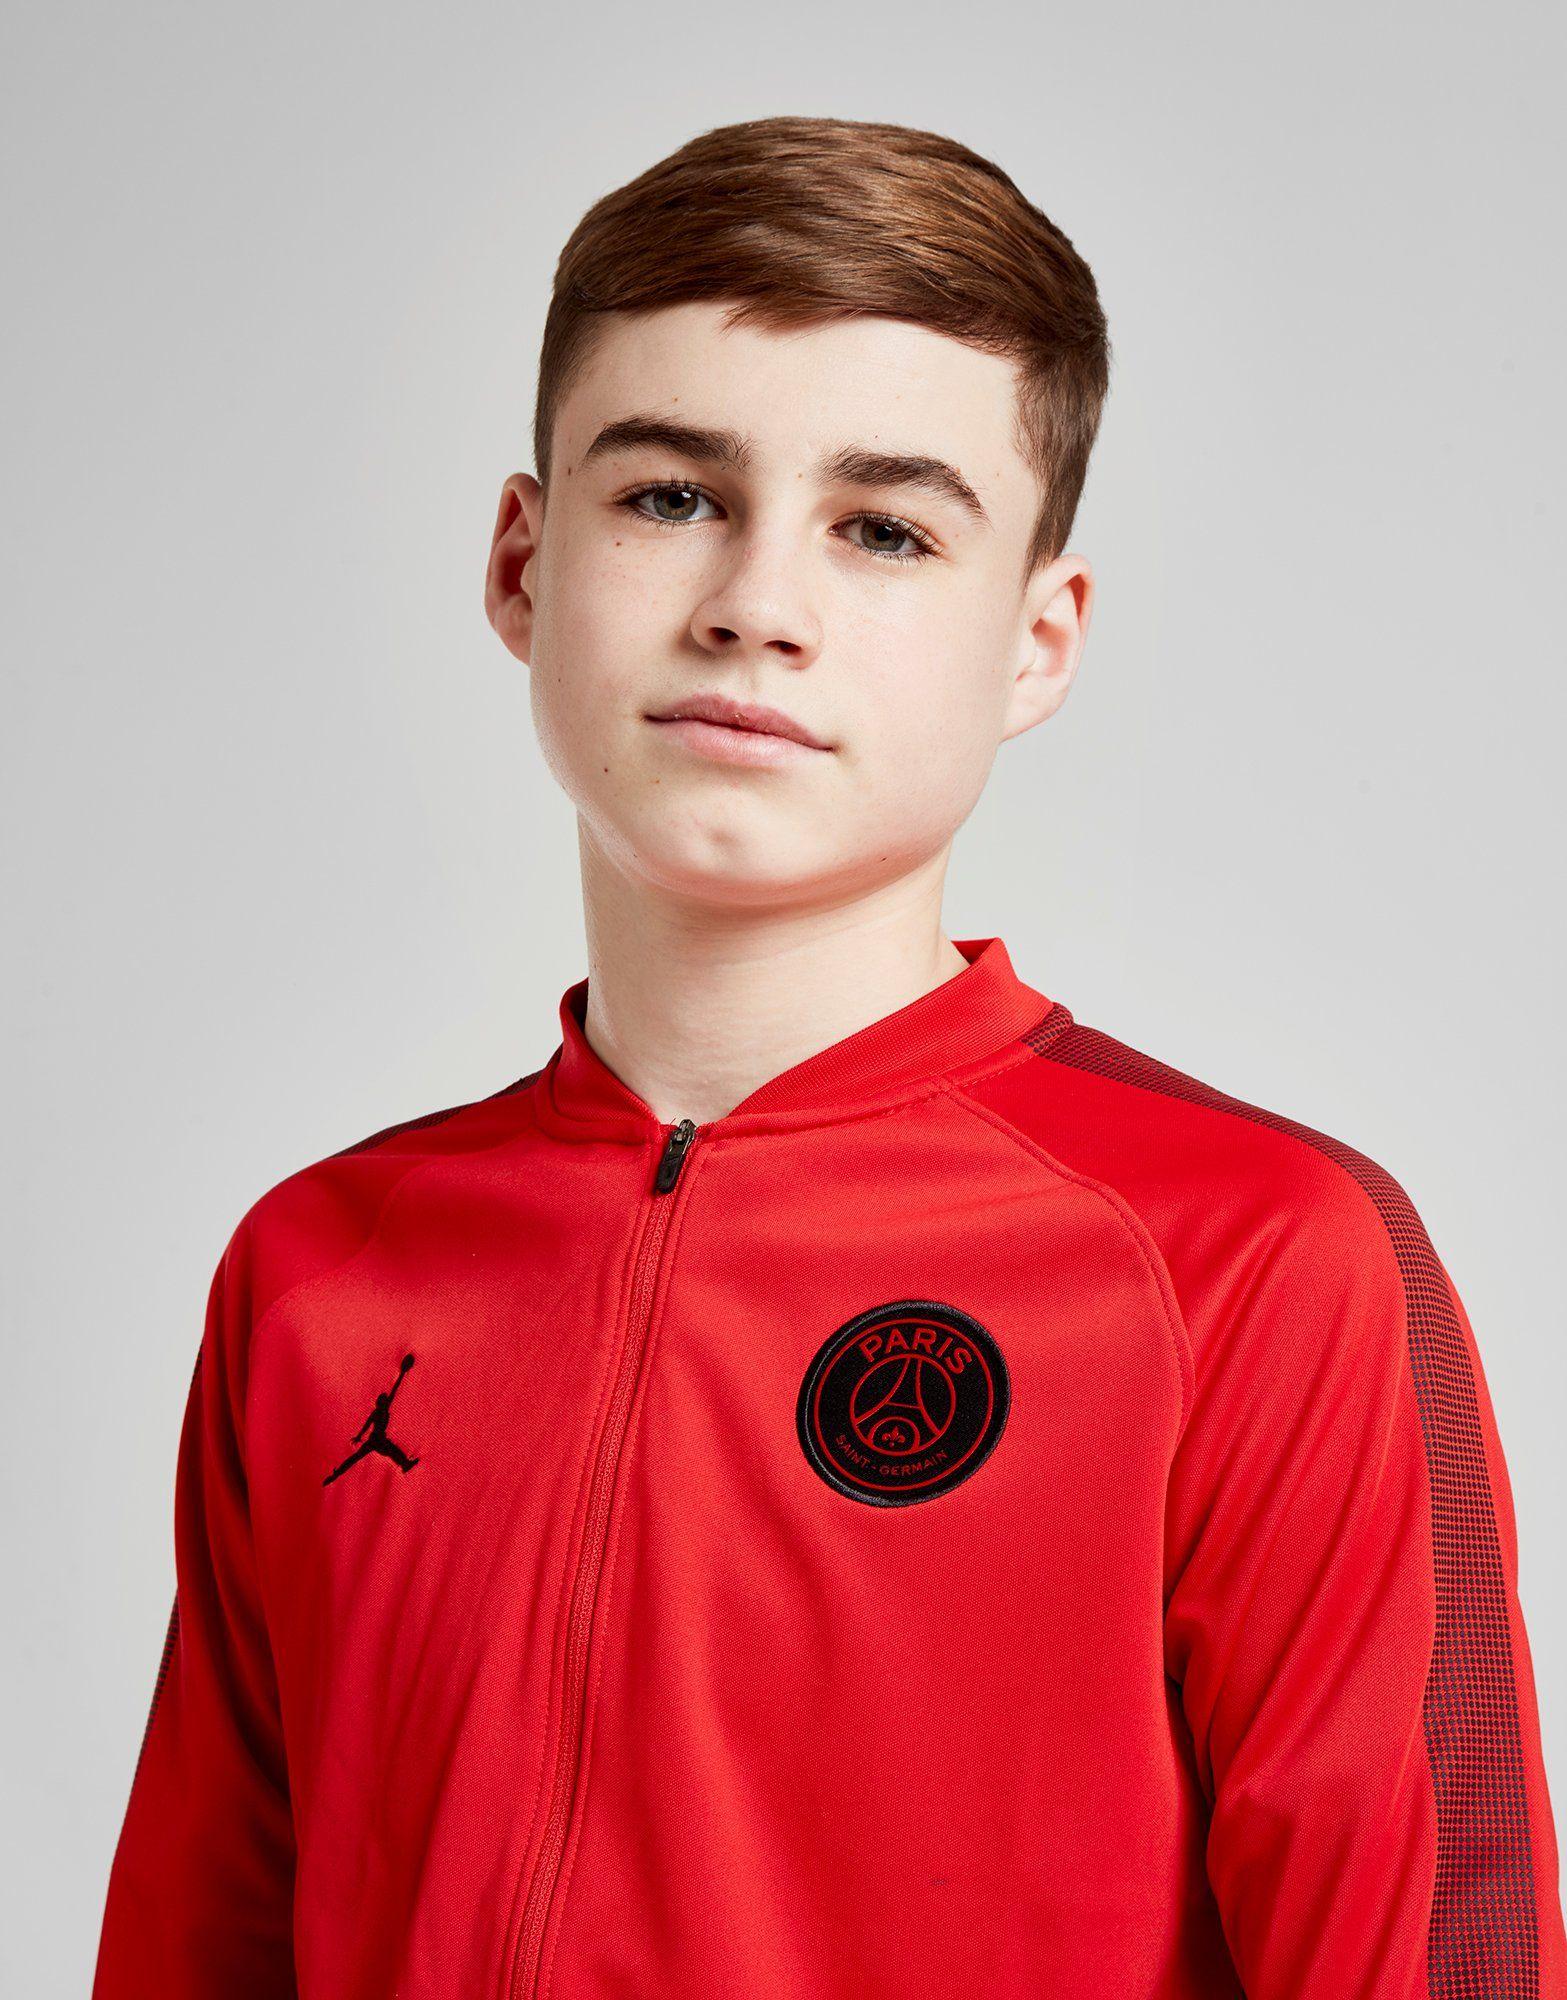 Jordan x Paris Saint Germain Survêtement Junior